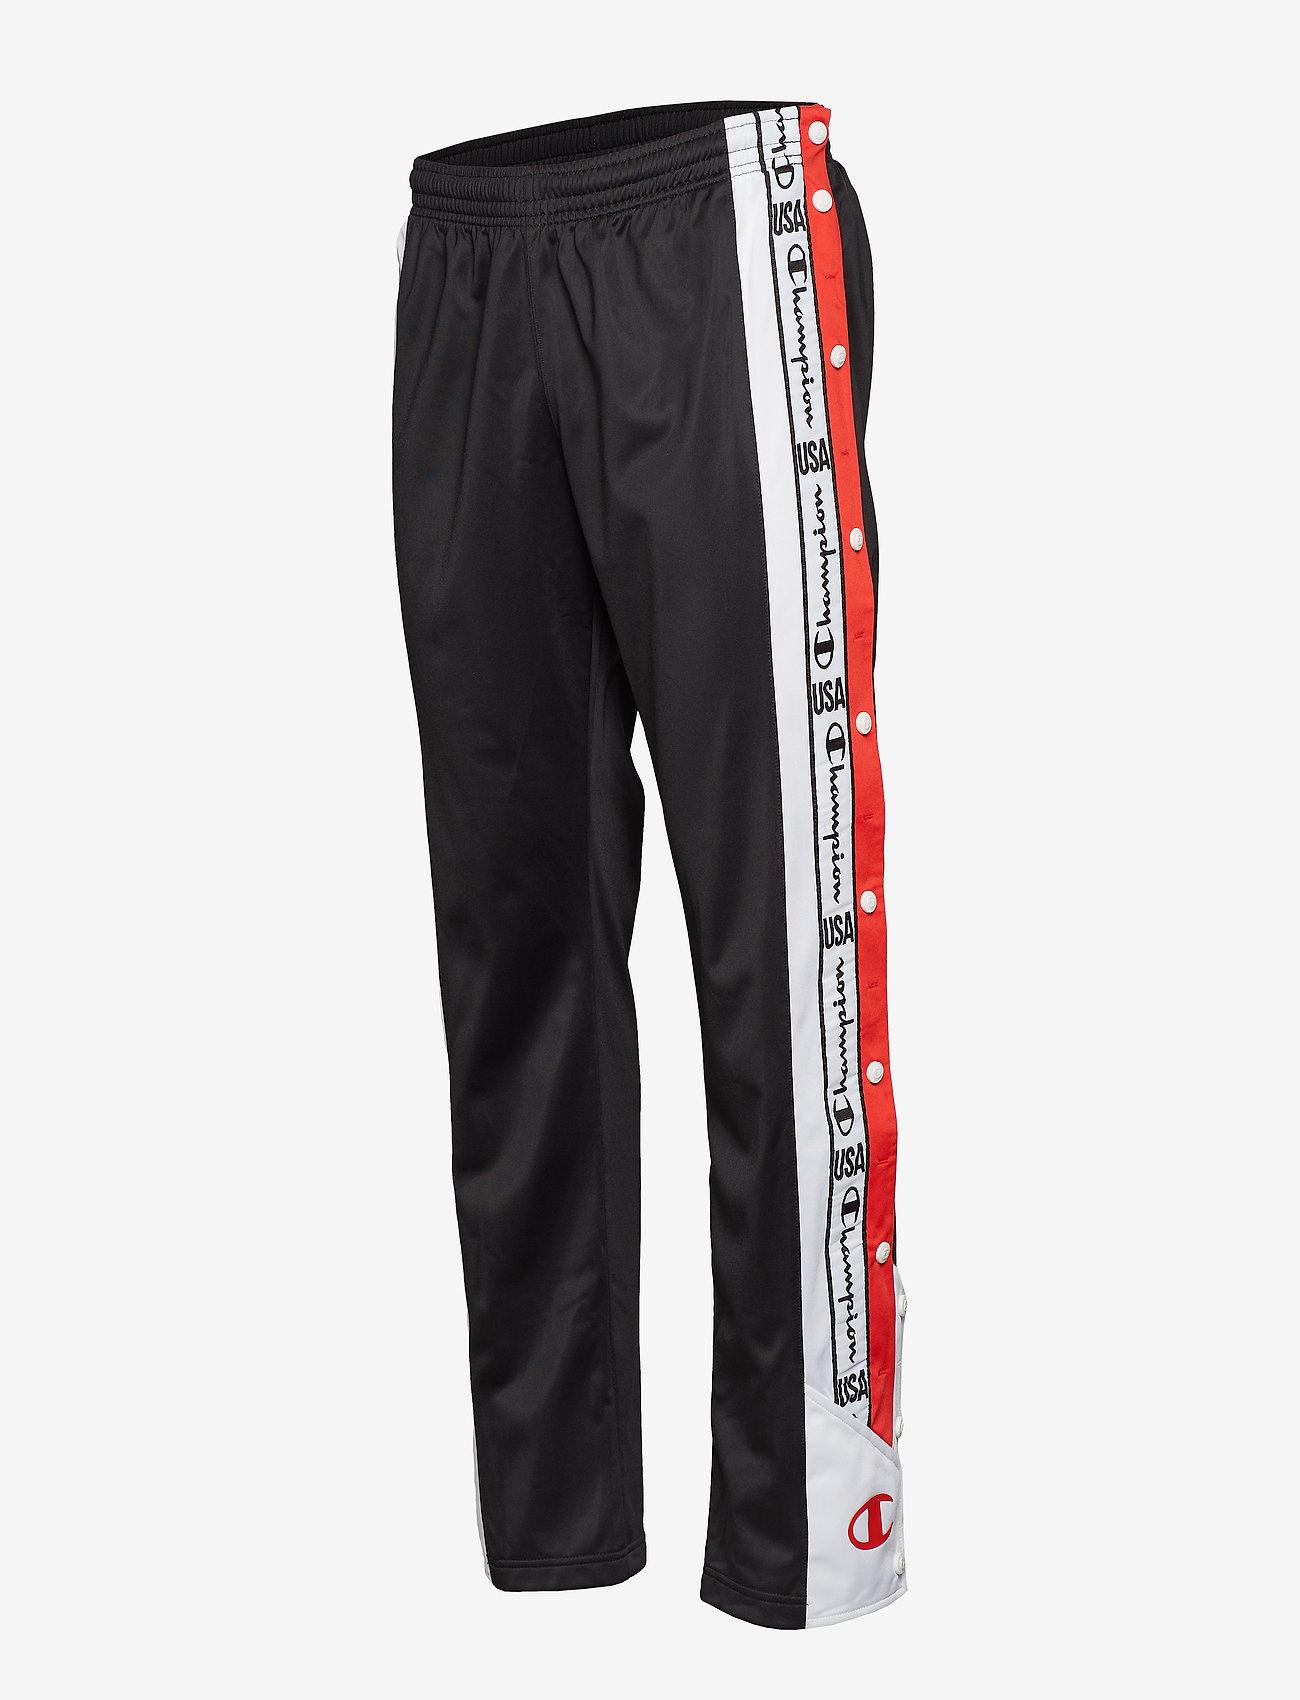 Champion Long Pants - Joggebukser BLACK BEAUTY - Menn Klær